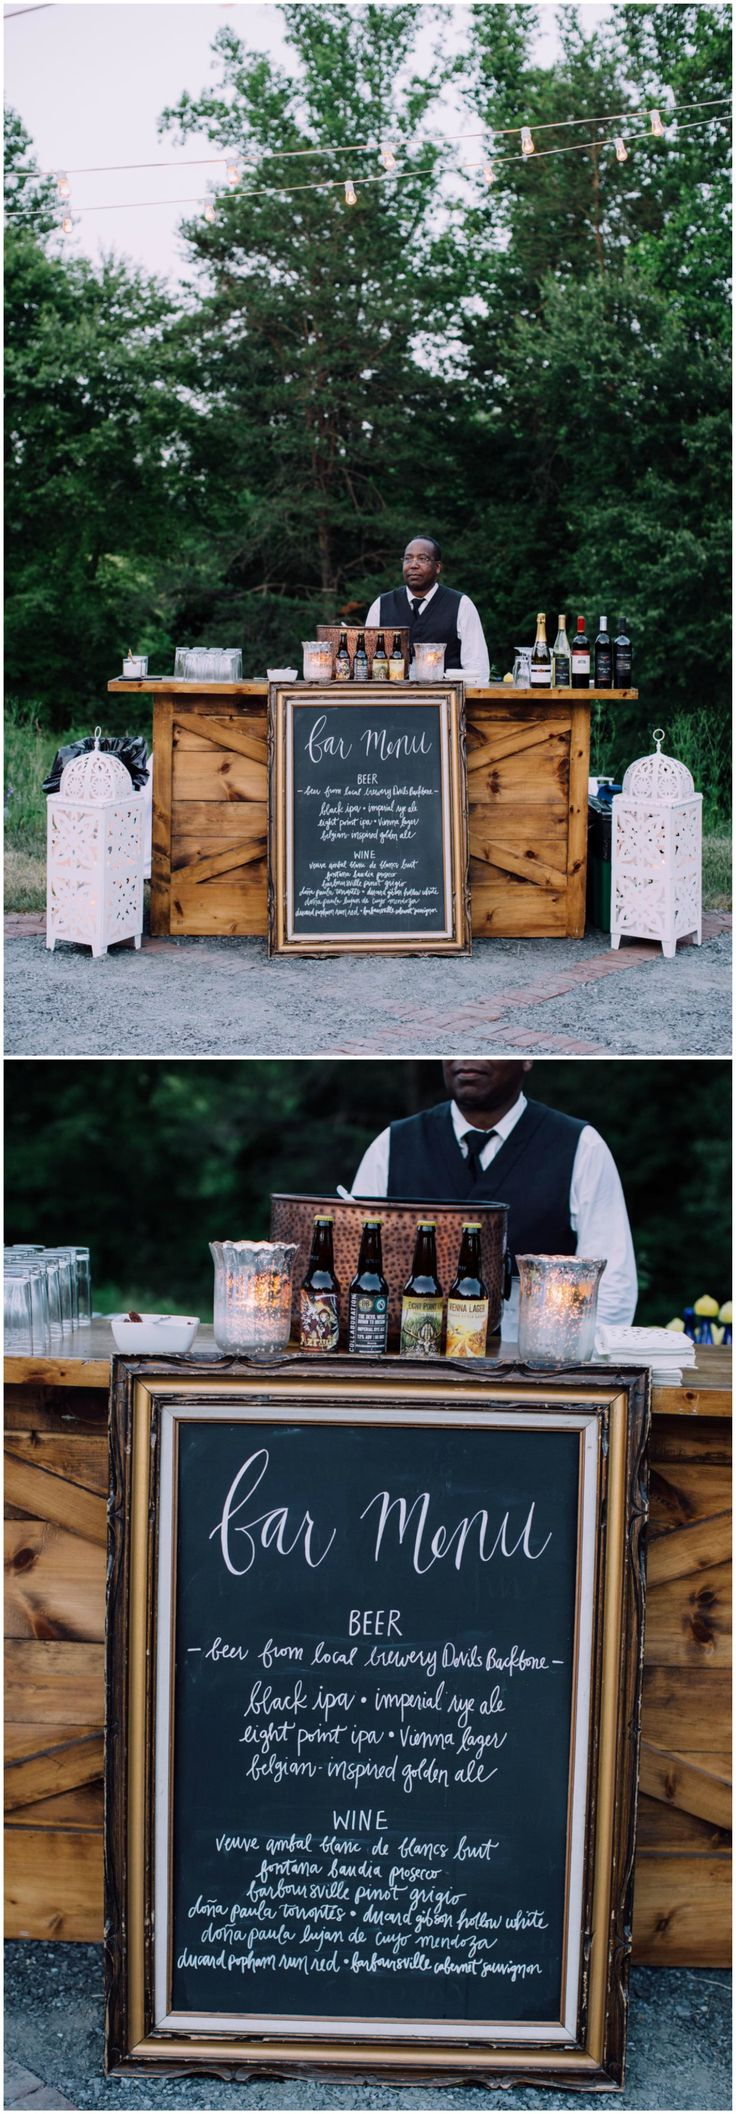 Wedding reception bar, wooden bar, chalkboard bar menu, beer and wine, white lanterns, bartender, happy hour // Agha Photo